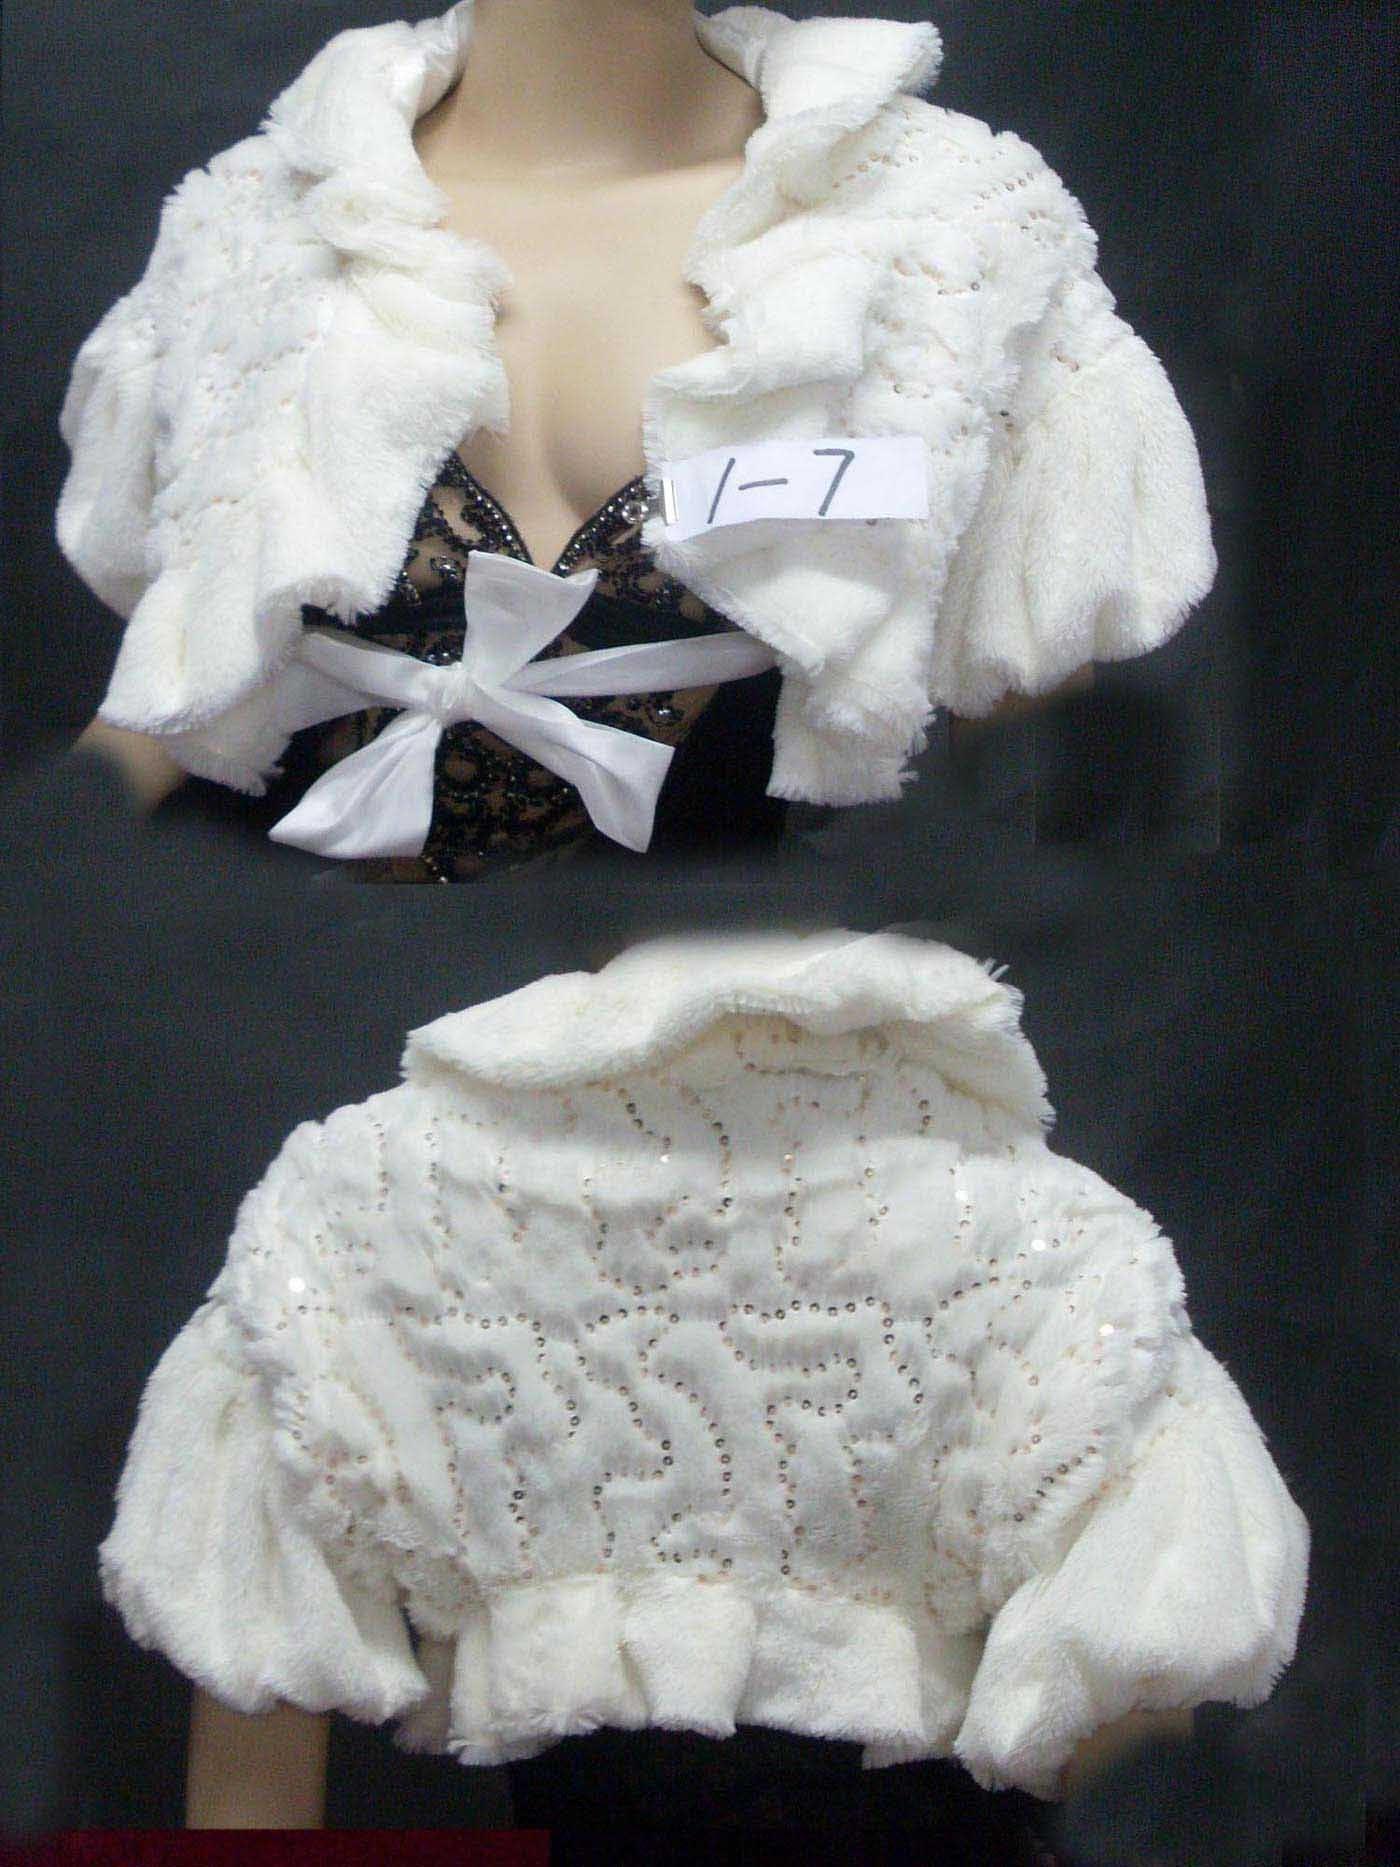 wedding hair accessories, wedding cakes, wedding dresses ring pillow, wedding accessories-16